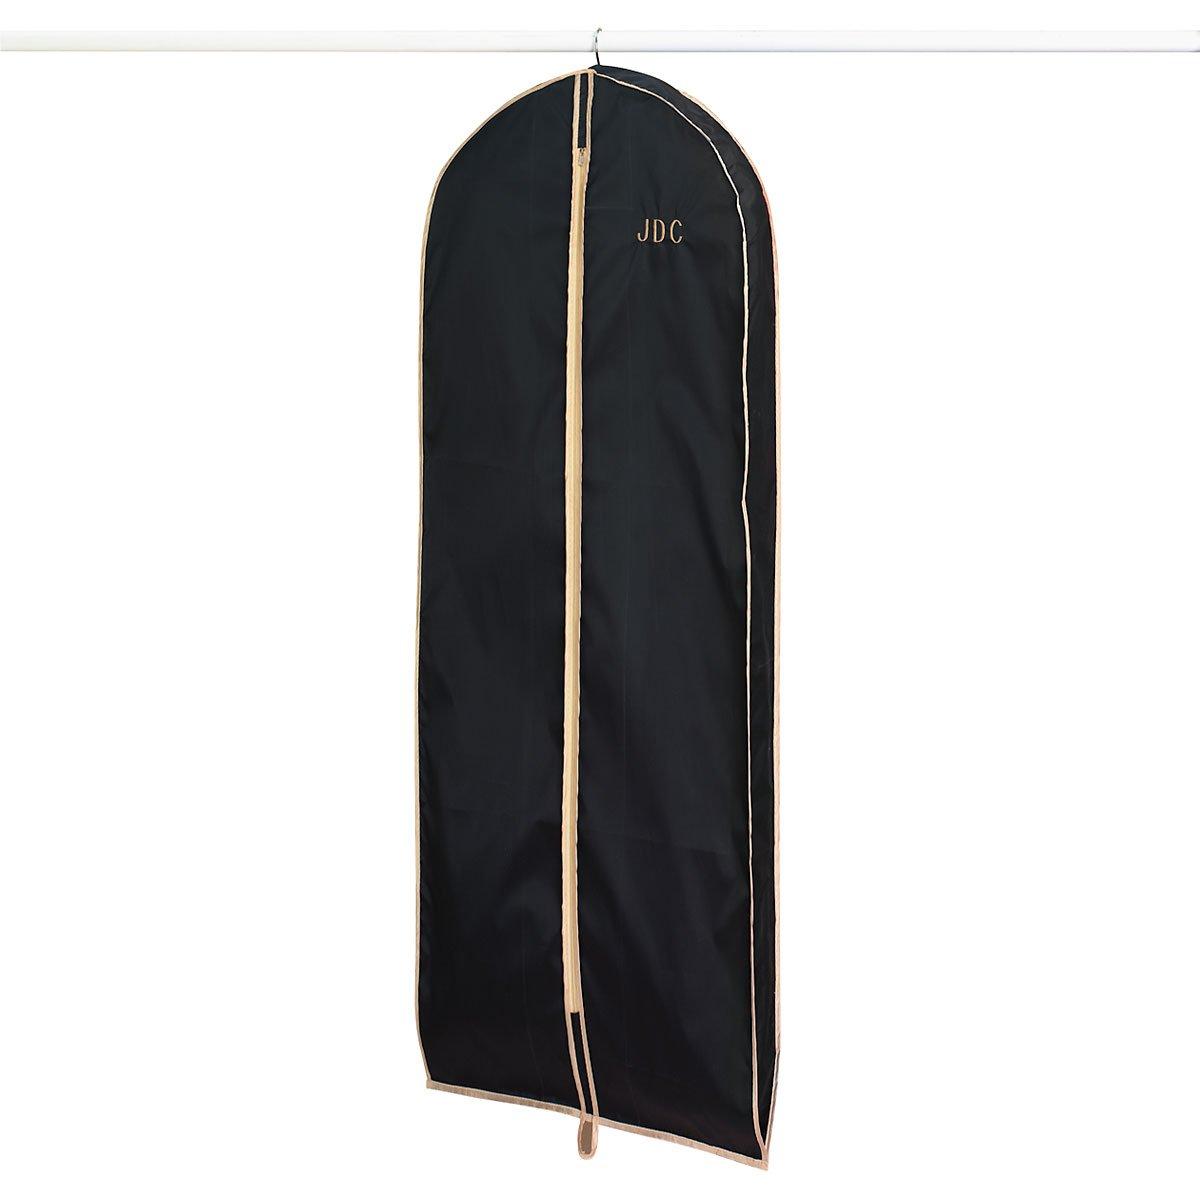 Monogram Garment Travel Bag, Polyester, 60'' Suit/Dress Bag